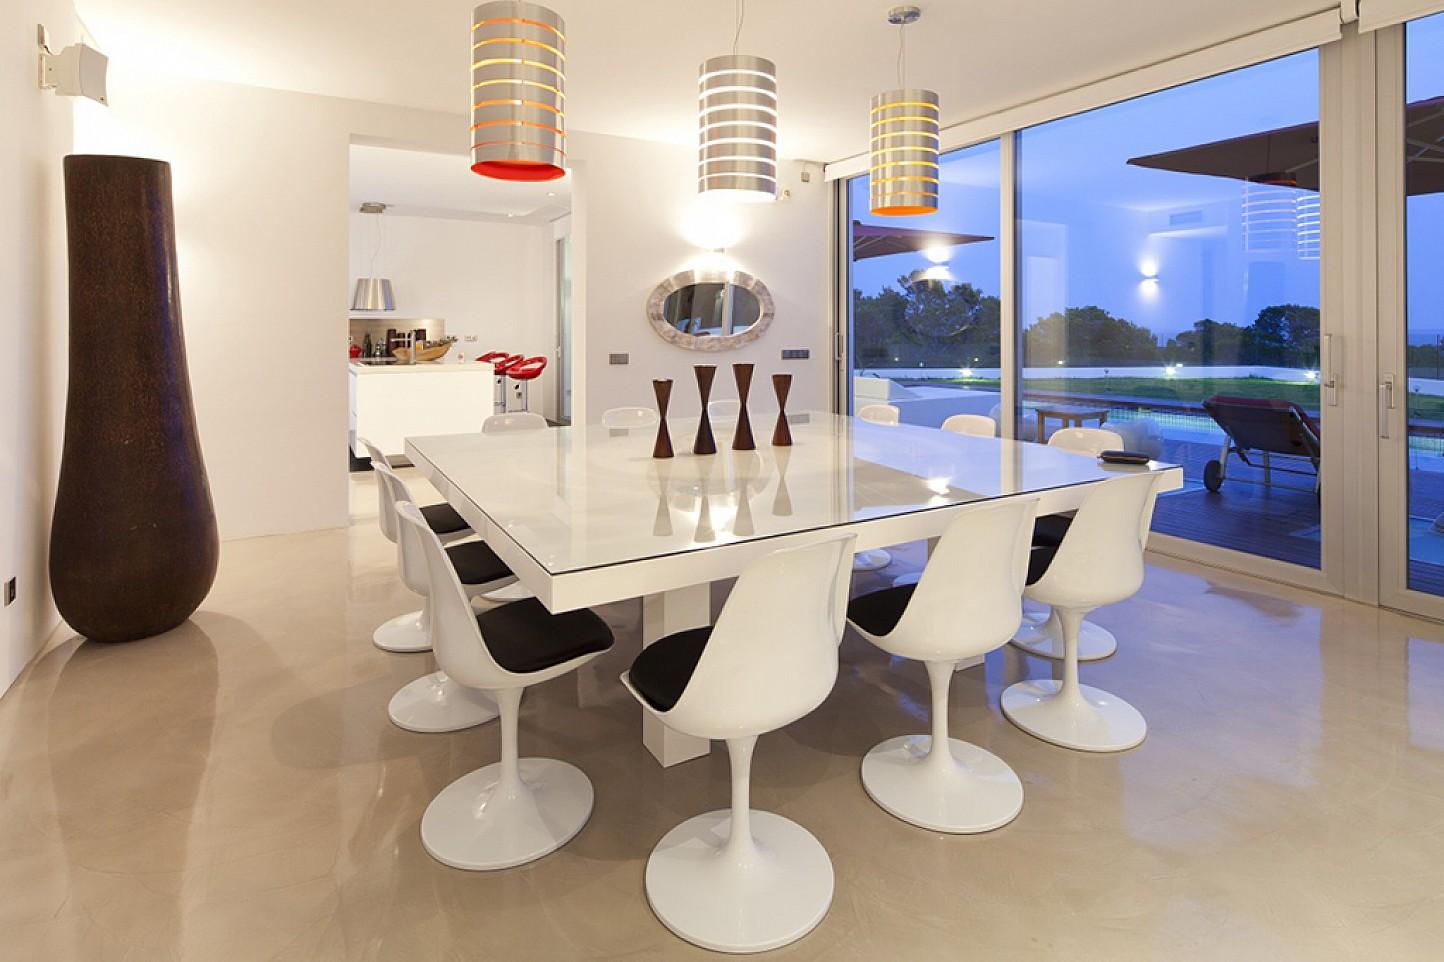 Comedor interior amplio, luminoso, con acceso a la terraza